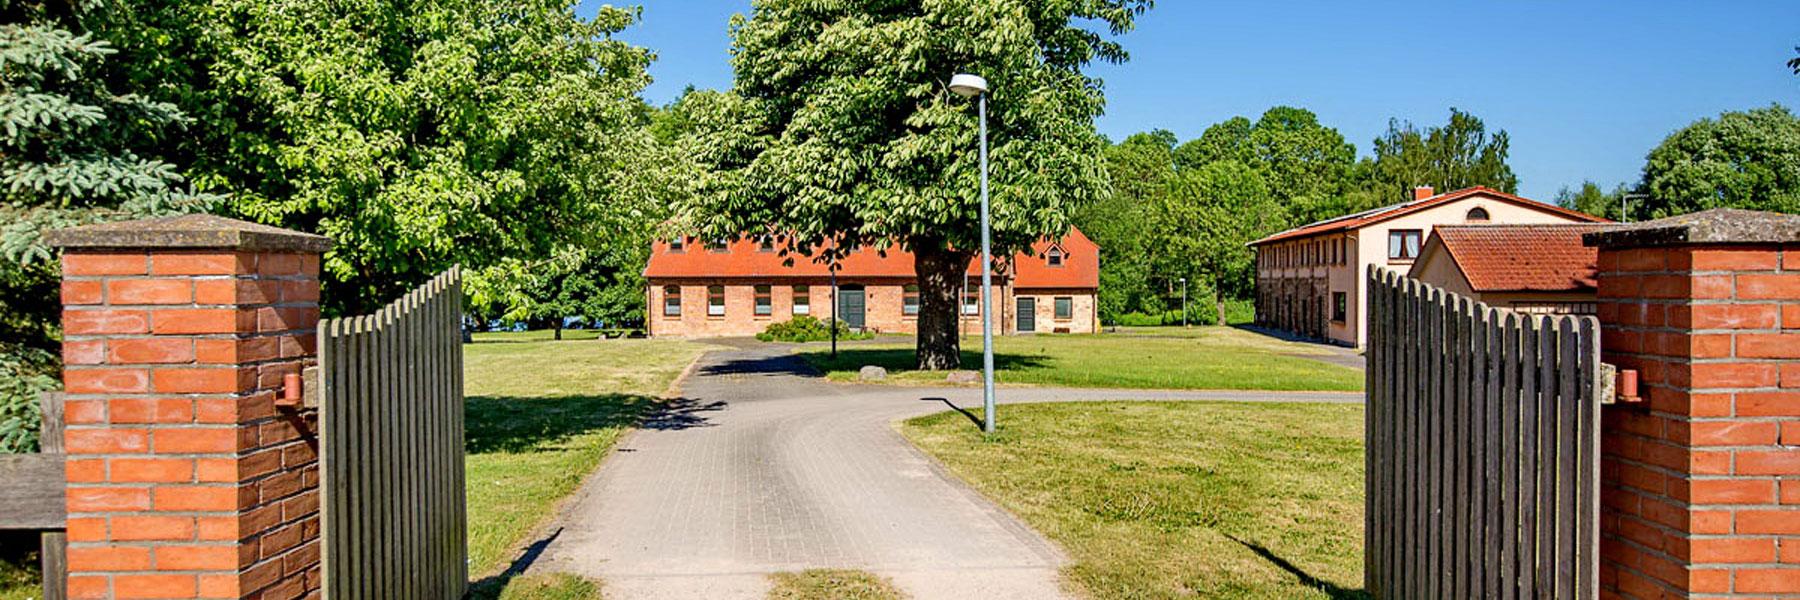 Hofeinfahrt - Gästehaus BärenHof